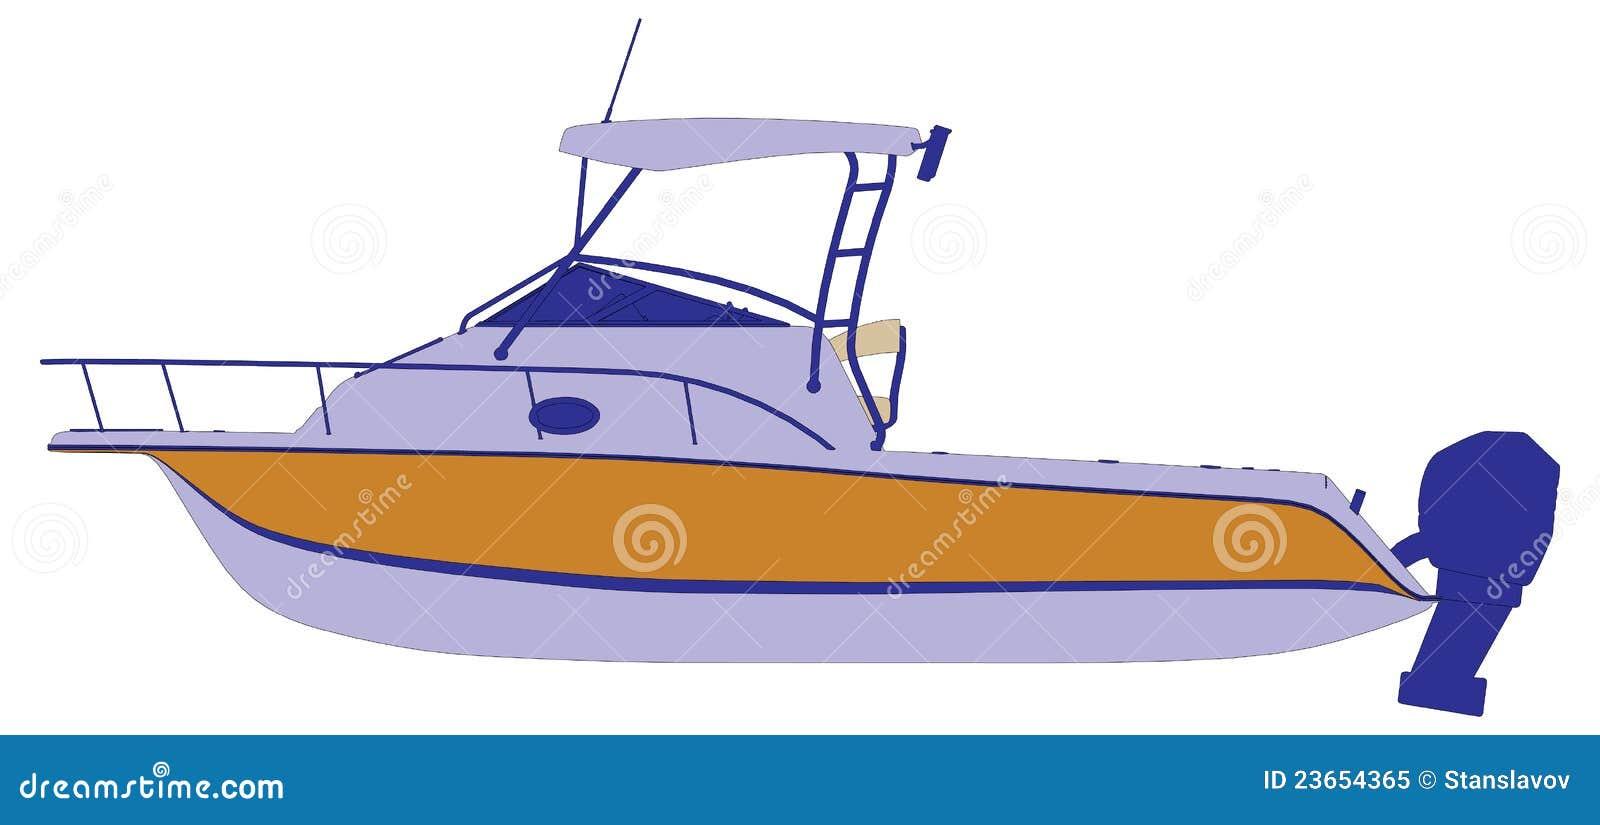 clipart power boat - photo #24